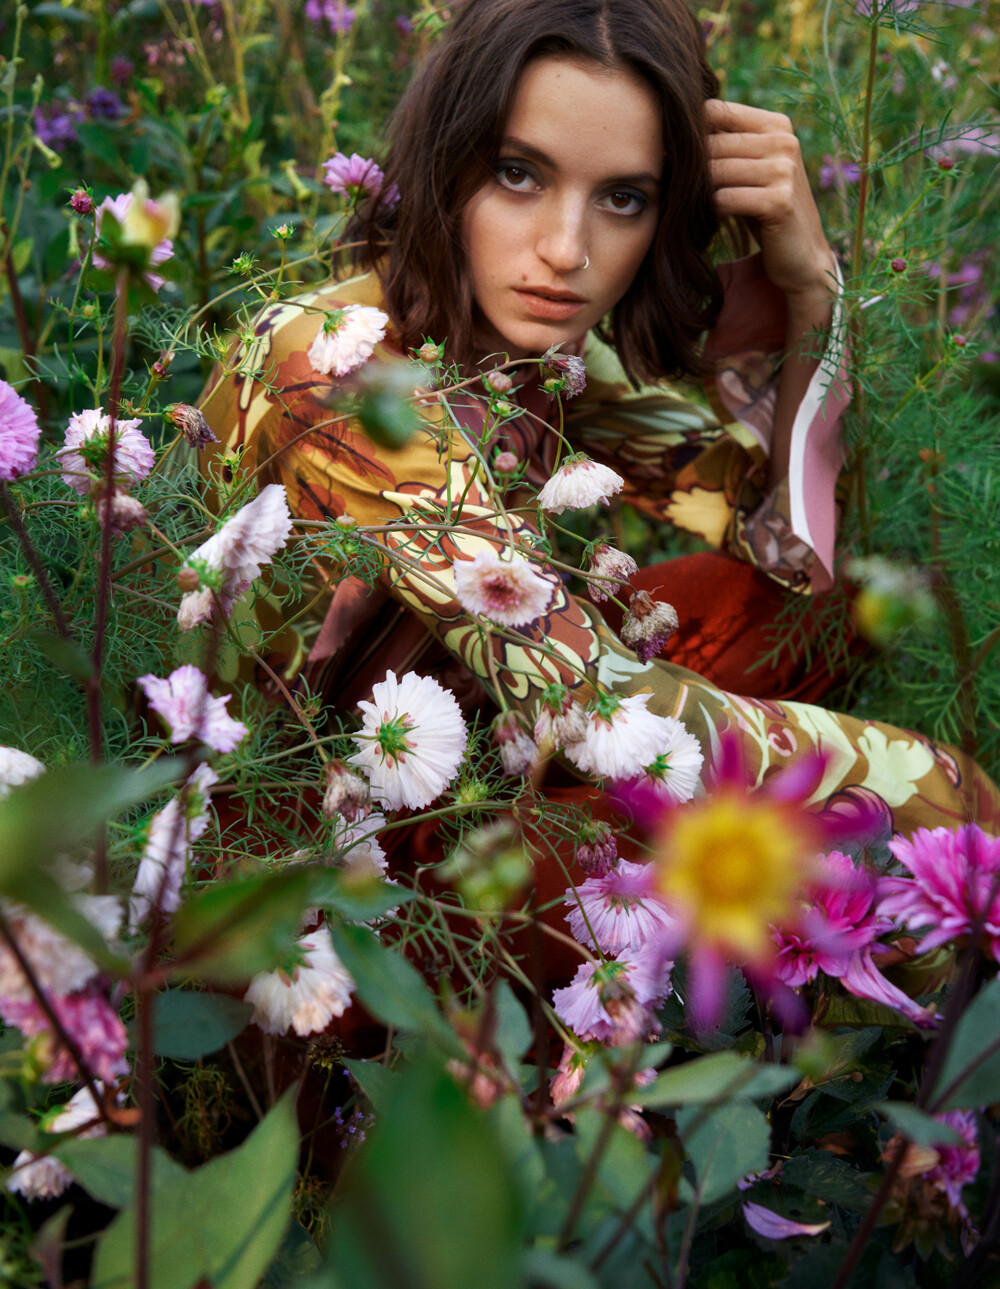 Garden flowers4